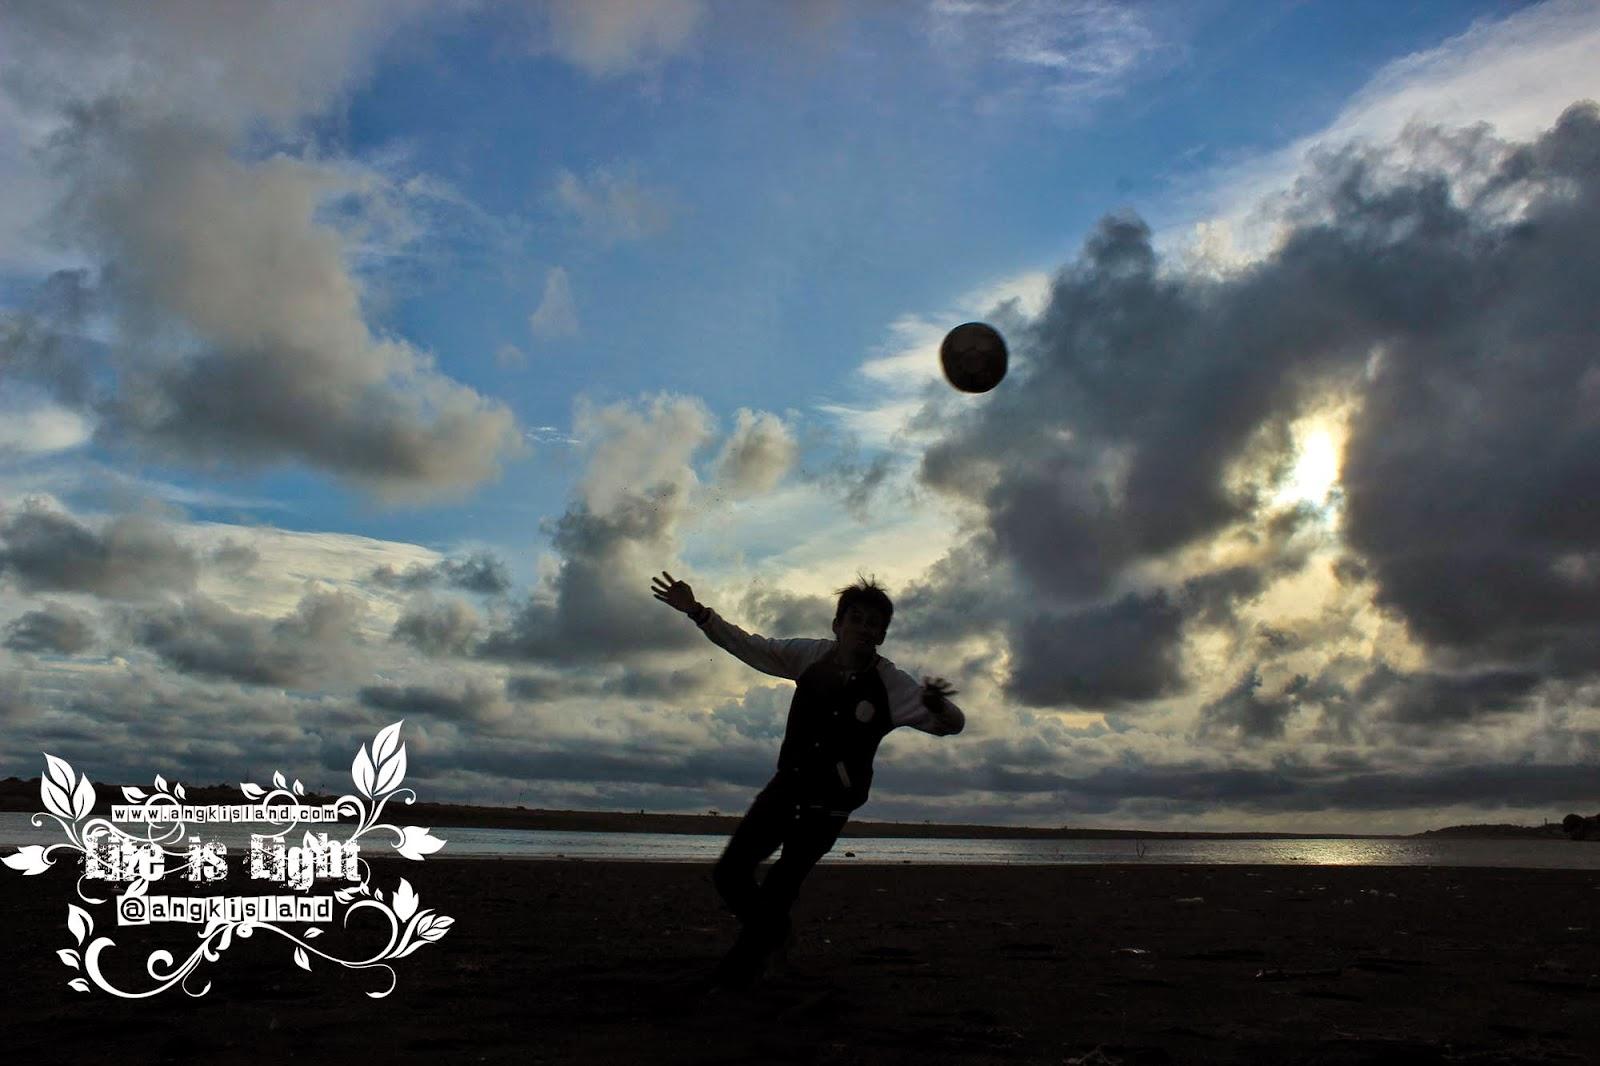 angki main bola